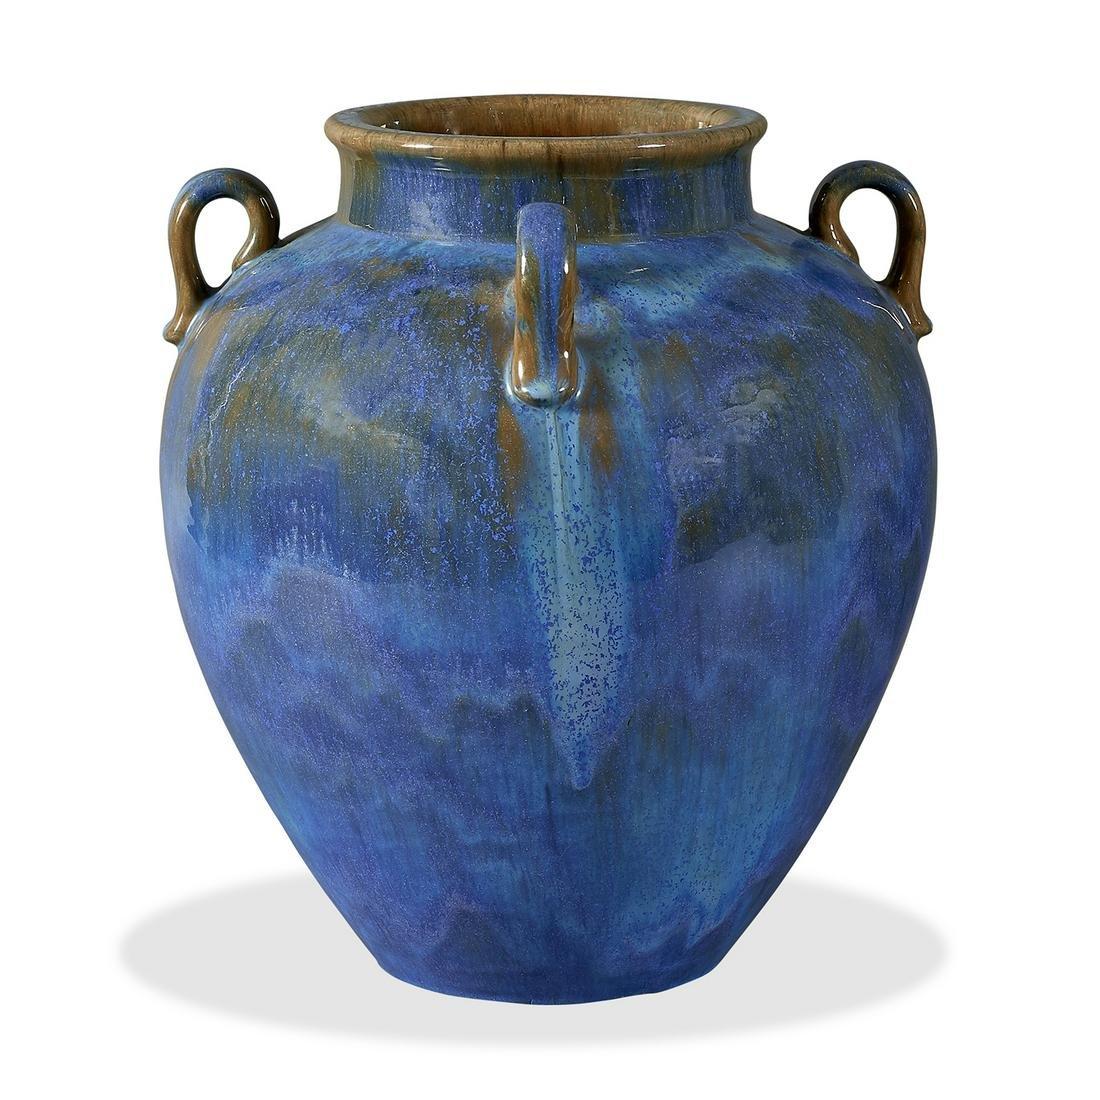 Fulper Pottery Co. Chinese Blue Flambé vase